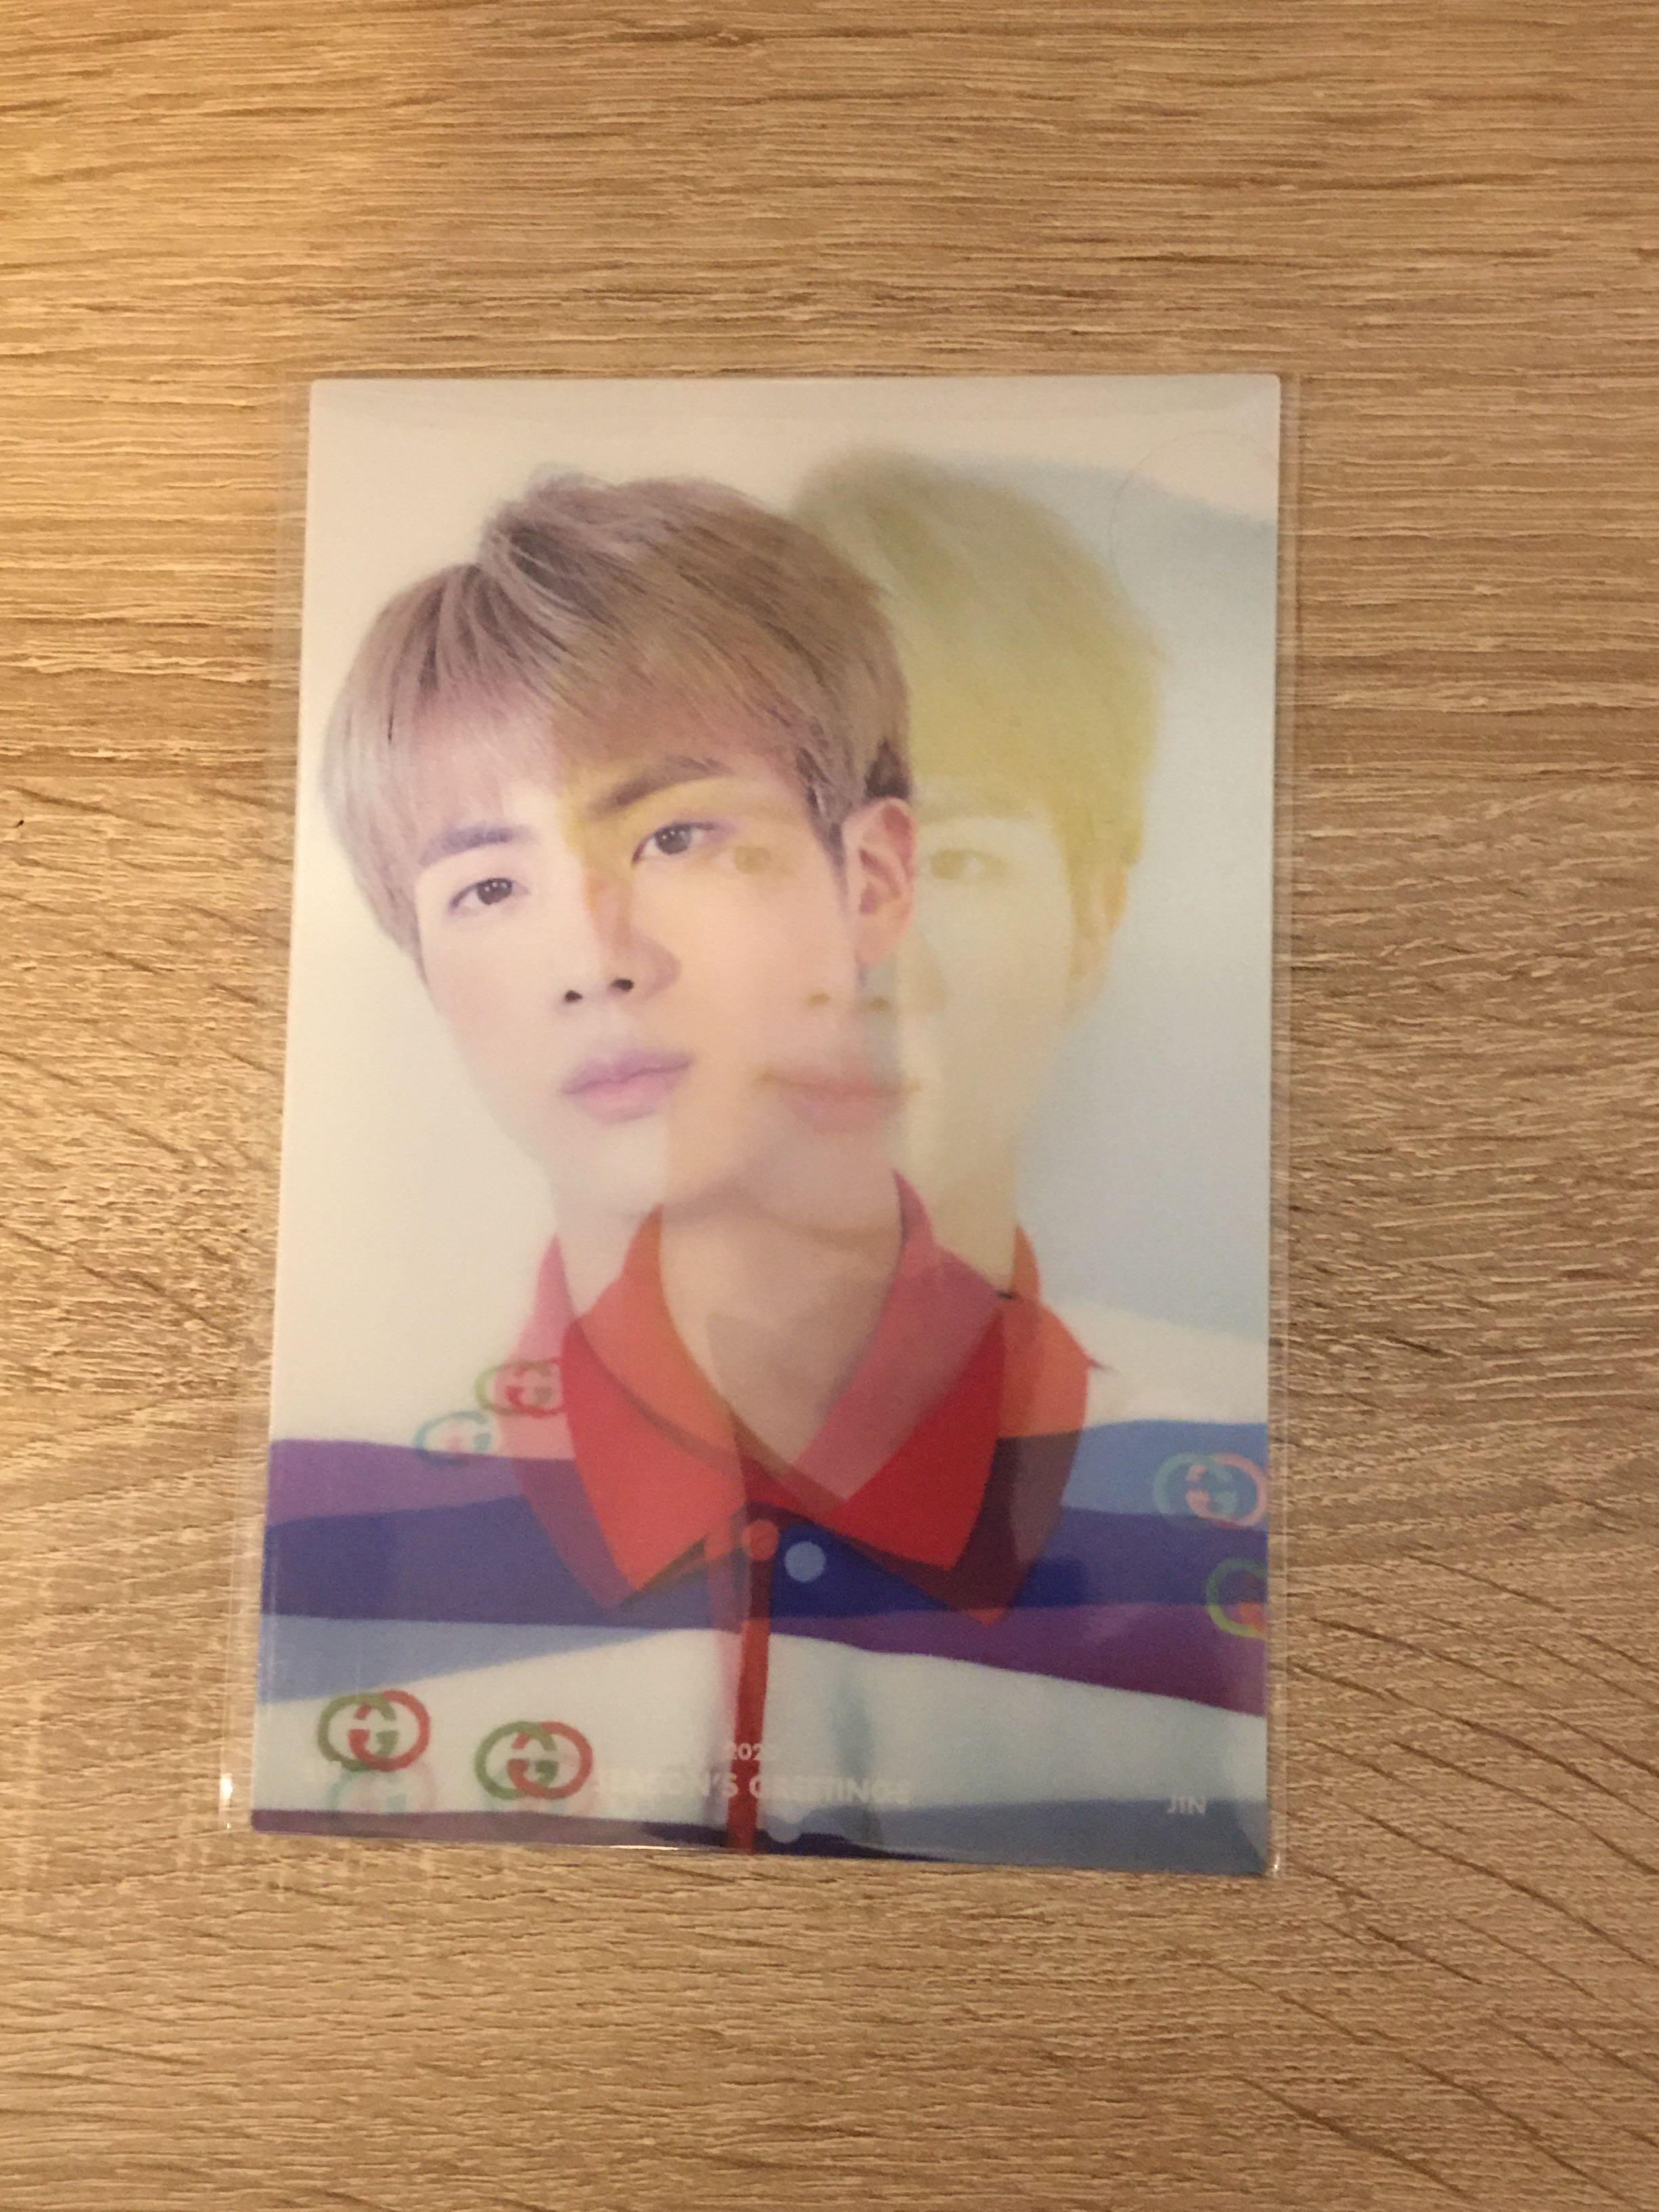 [WTS] JIN LENTICULAR CARD (BTS SEASON'S GREETINGS 2020)